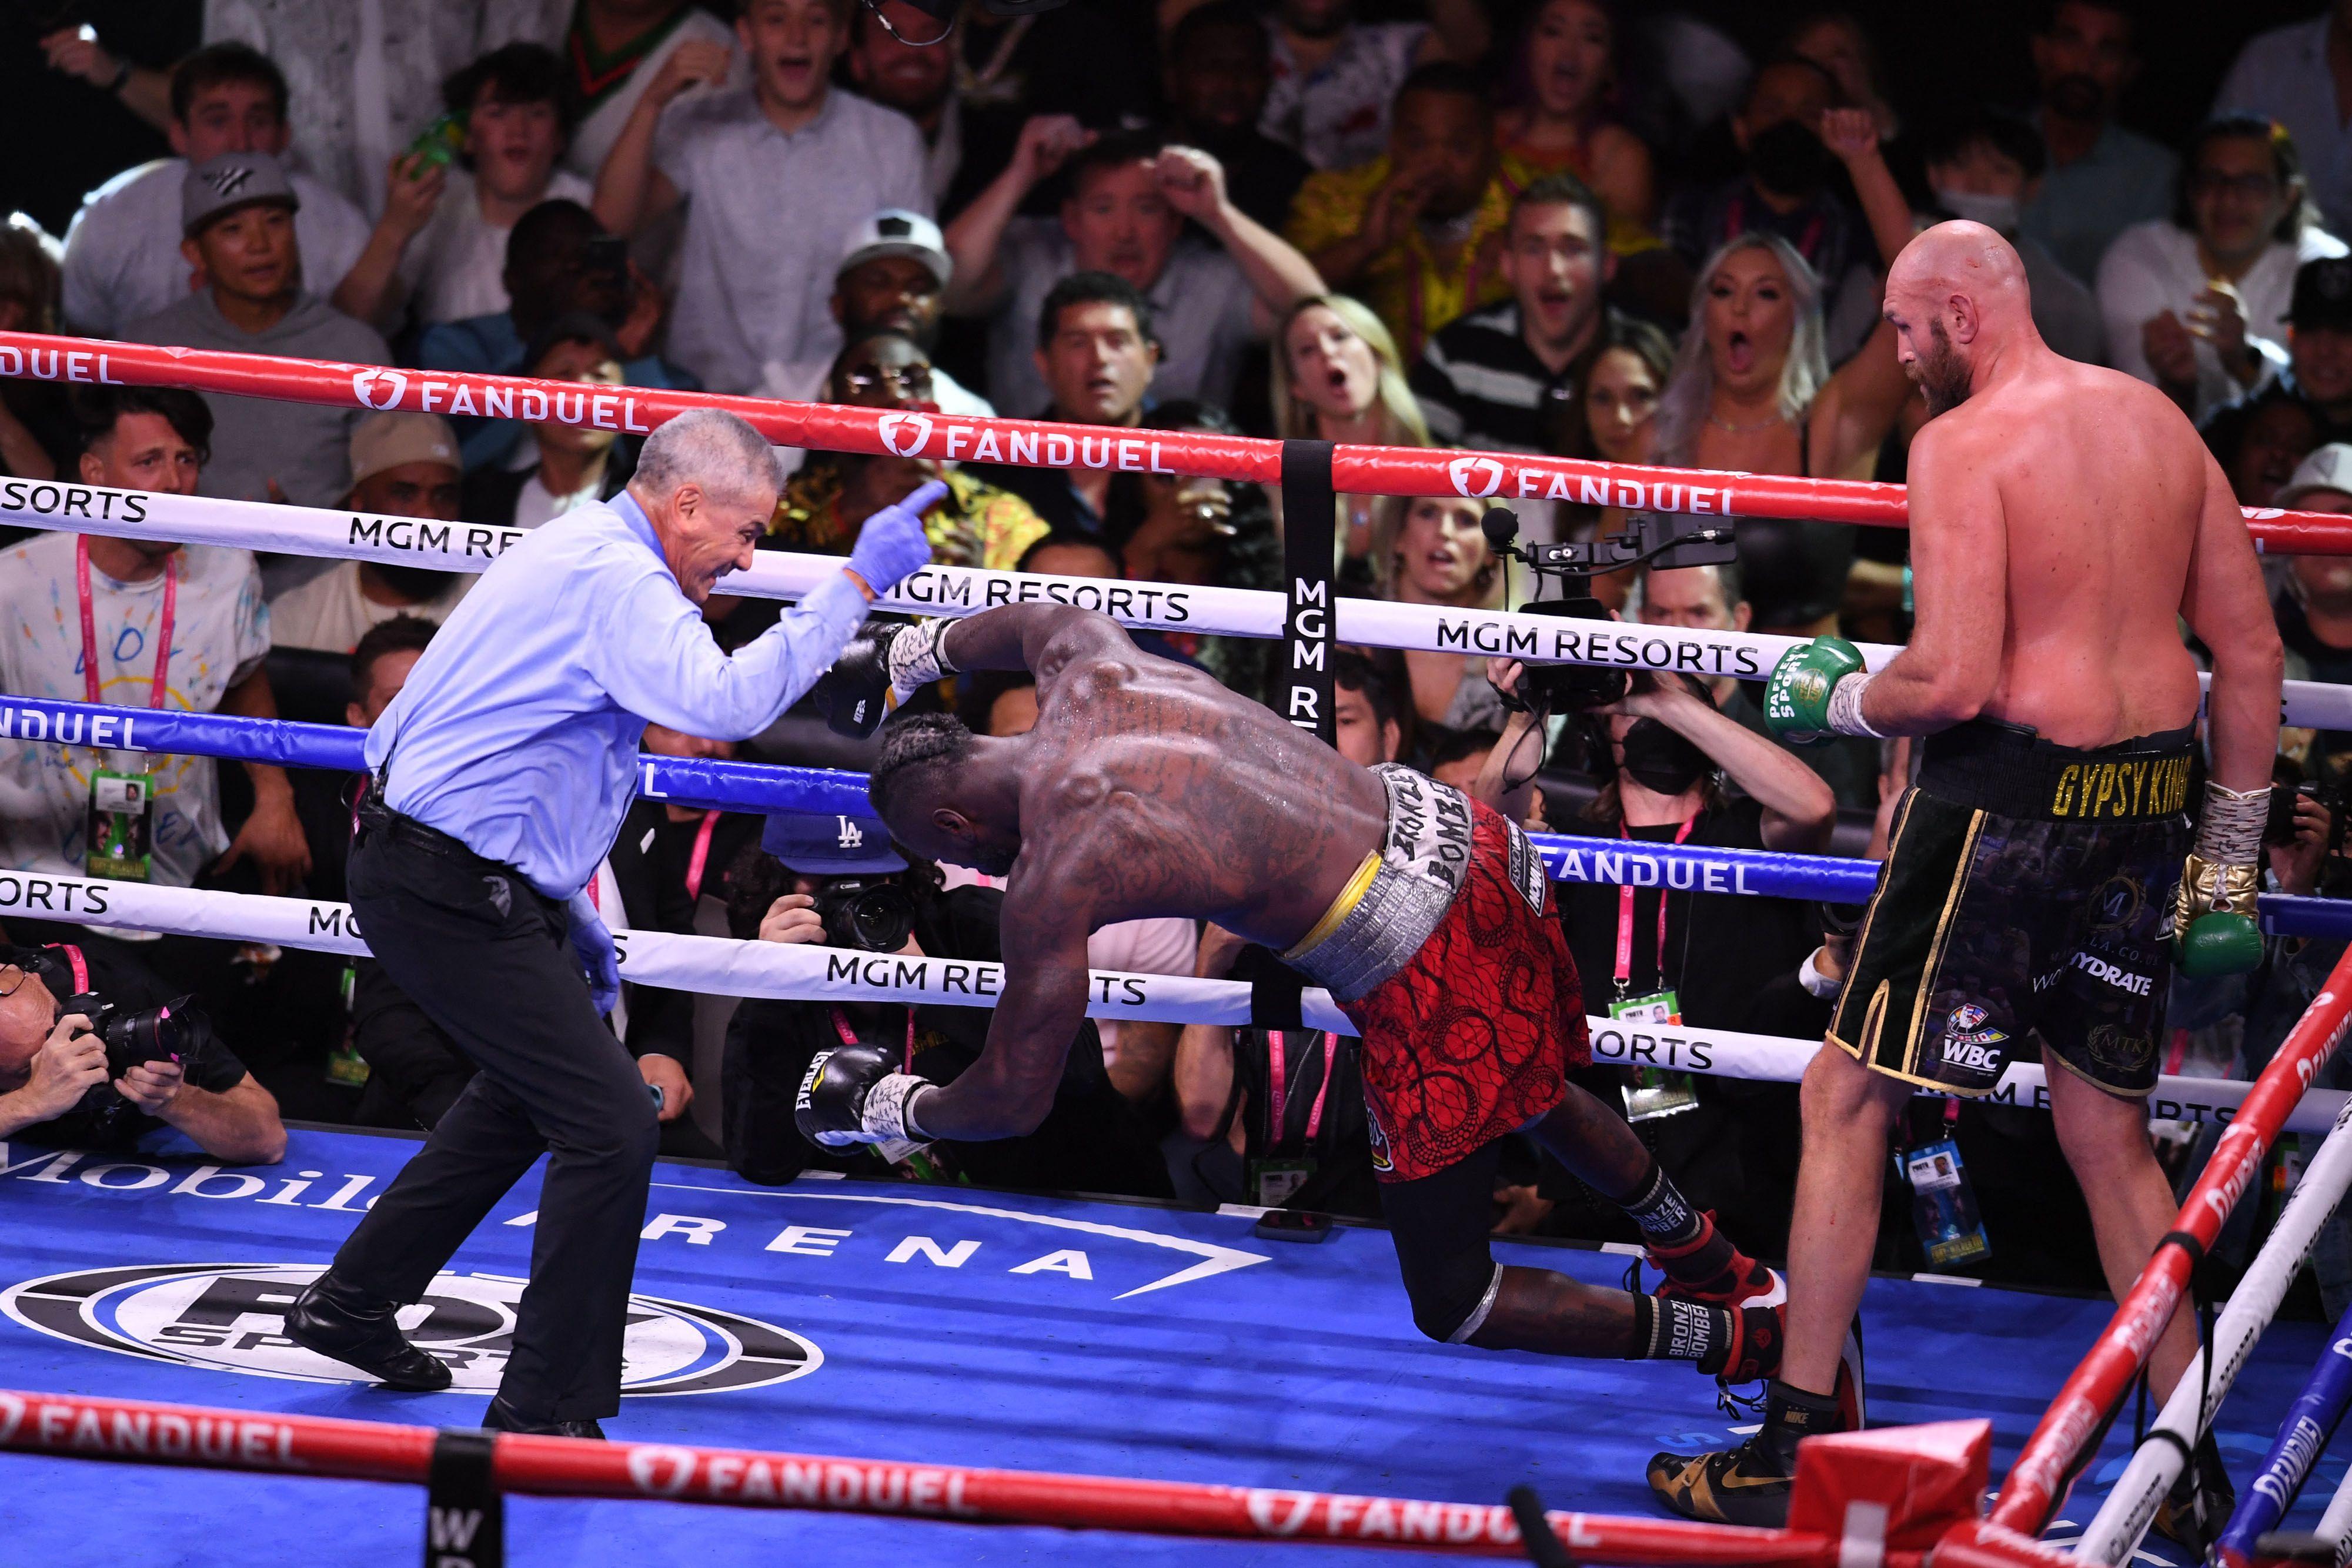 USA-BOX-HEAVY-WBC-GBR-US-FURY-WILDER